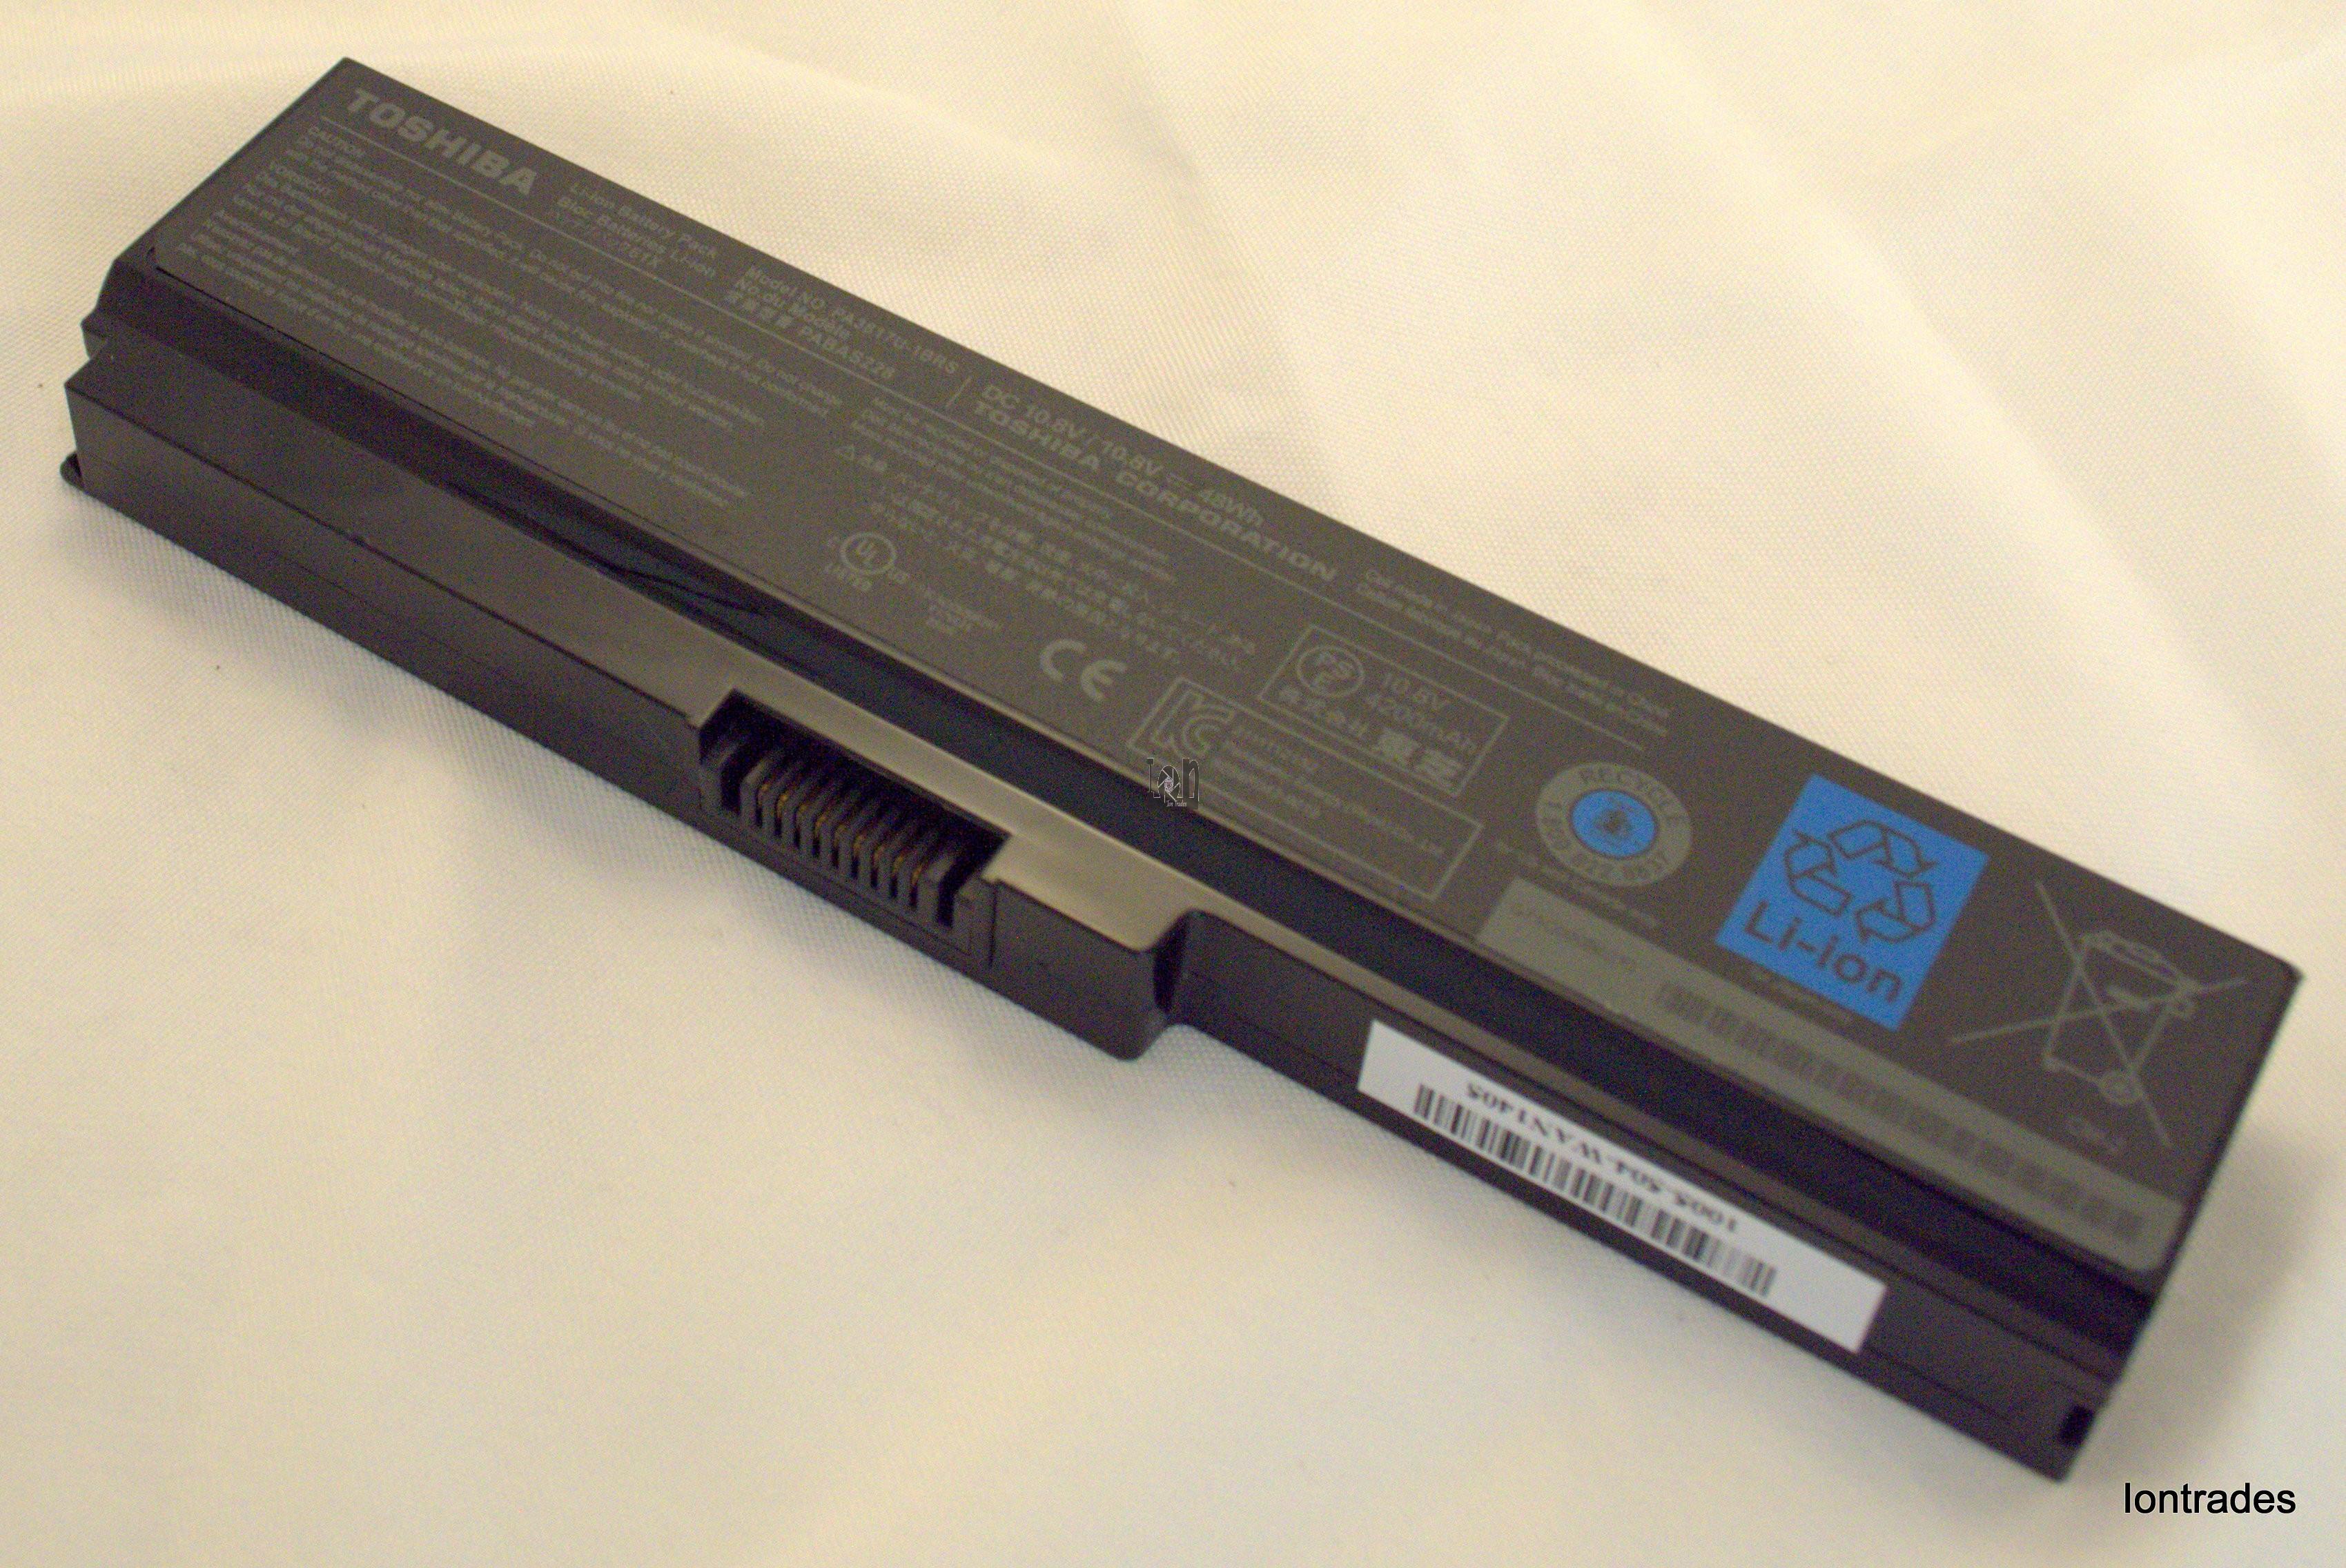 Toshiba PA3817U-1BRS 4200mAh Battery OEM Genuine Laptop Parts